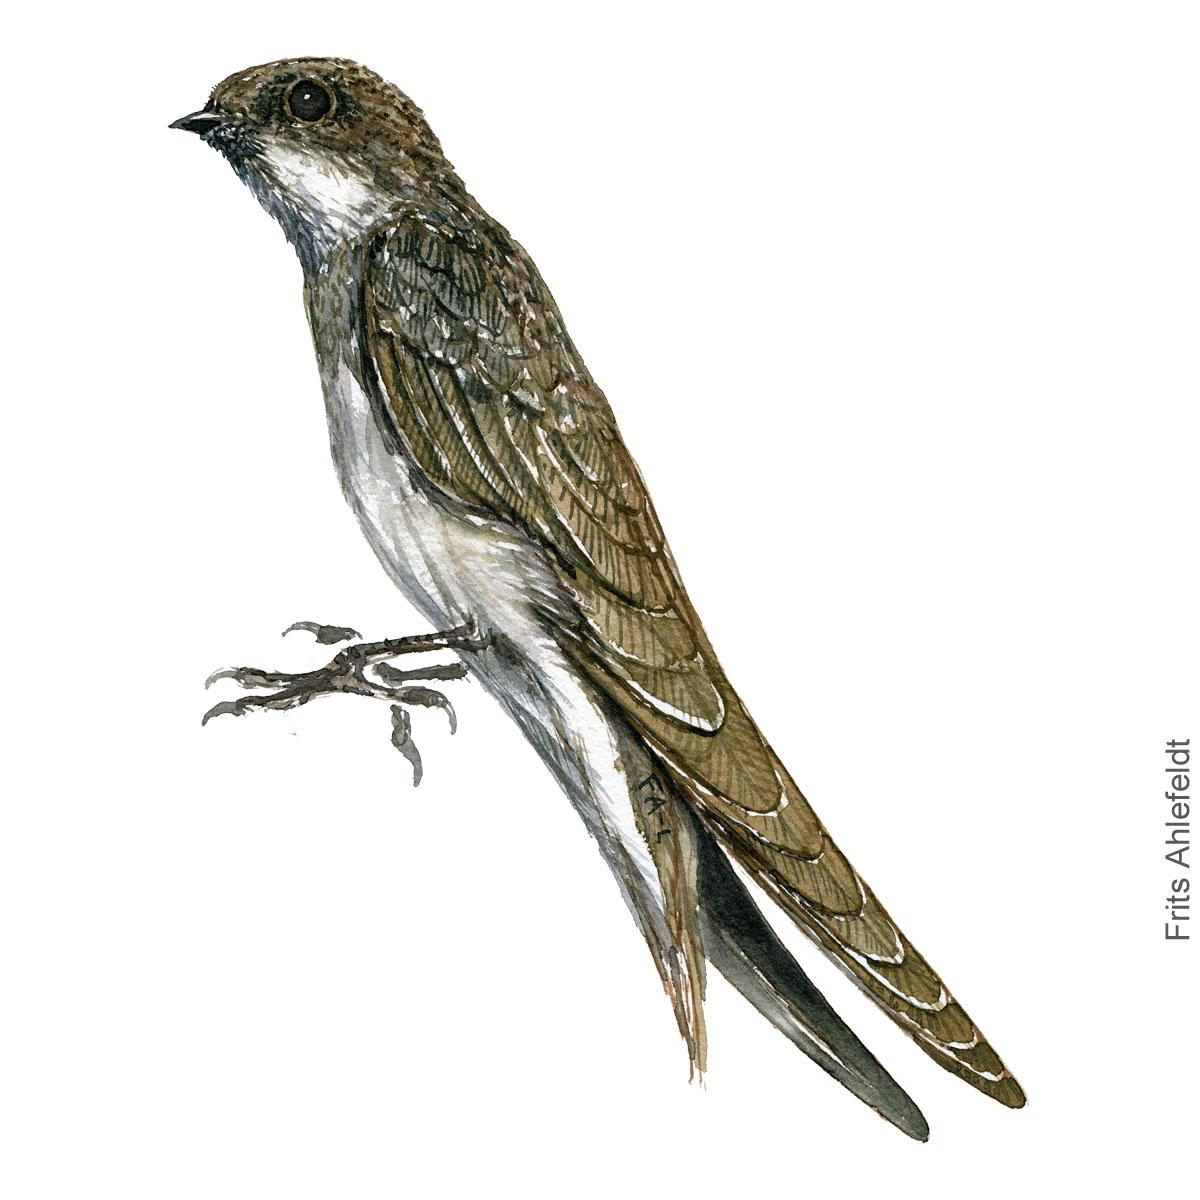 Sand martin - Digesvale Akvarel. Watercolor bird illustration by Frits Ahlefeldt